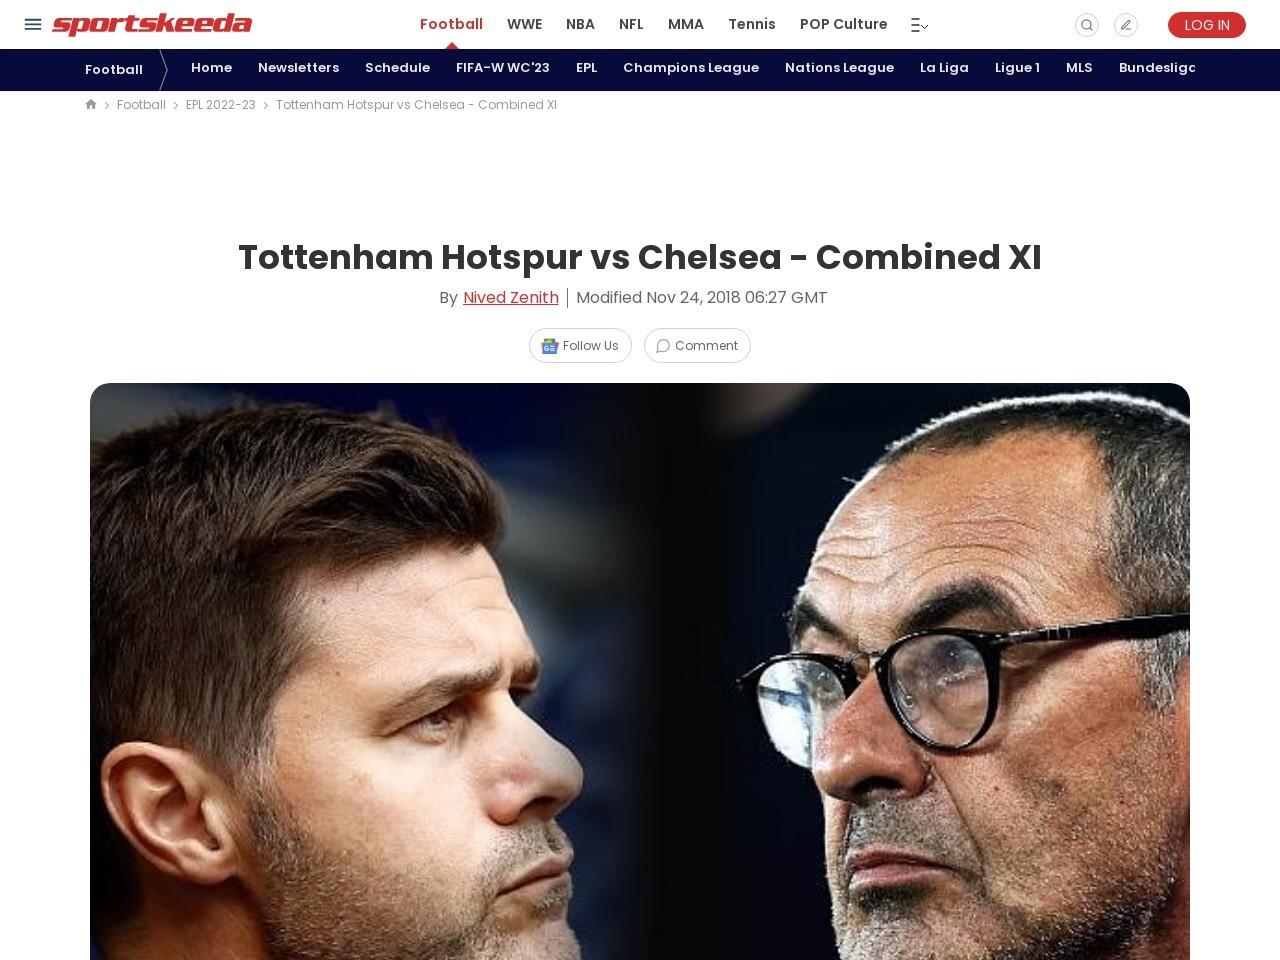 Tottenham Hotspur vs Chelsea – Combined XI